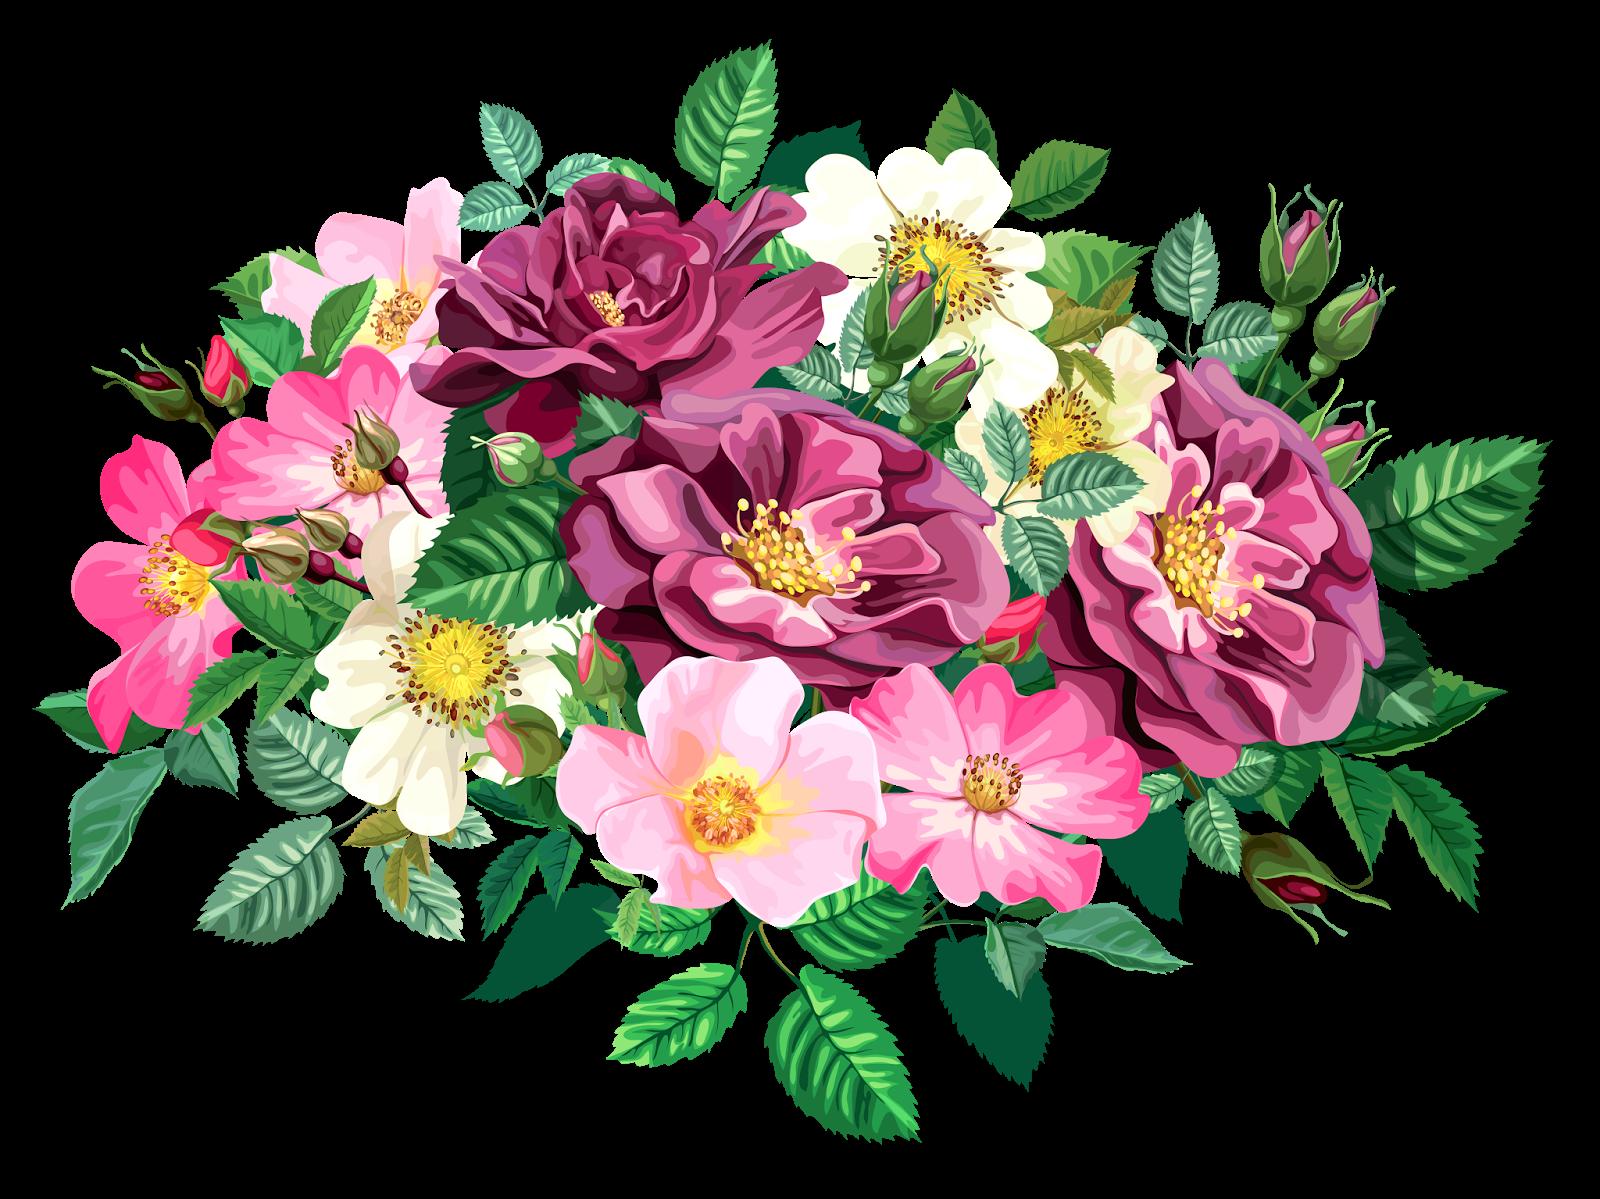 Bouquet of flower clipart vector black and white download ROSE BOUQUET CLİPART TRANSPARENT | Blisse Design Studio vector black and white download